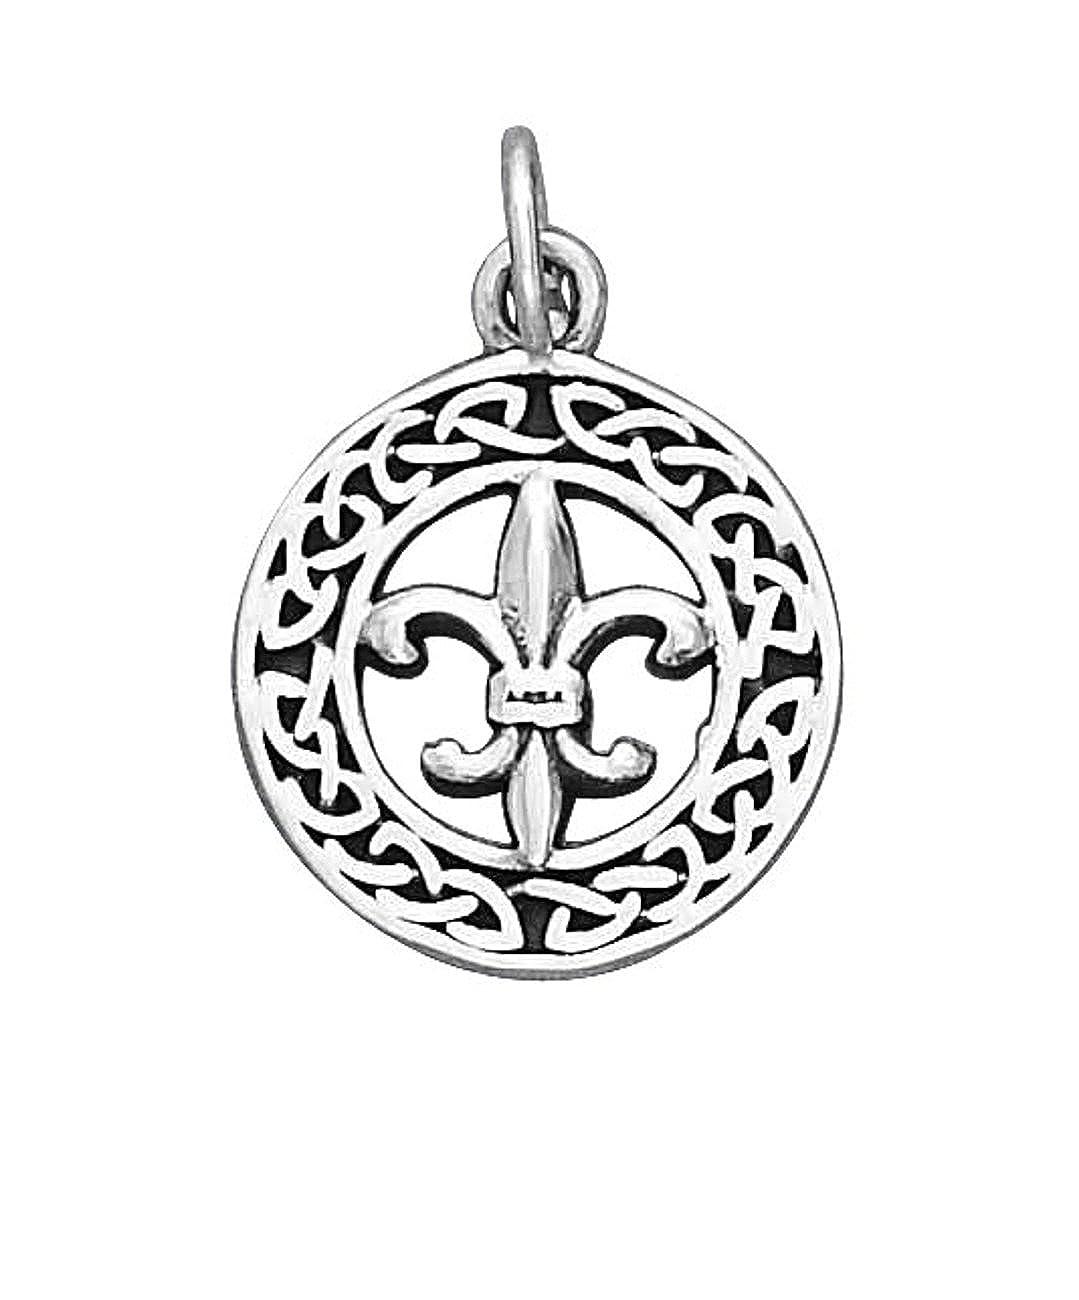 Sterling Silver Girls .8mm Round Celtic Wreath Pendant Necklace Fleur De Lis In Center